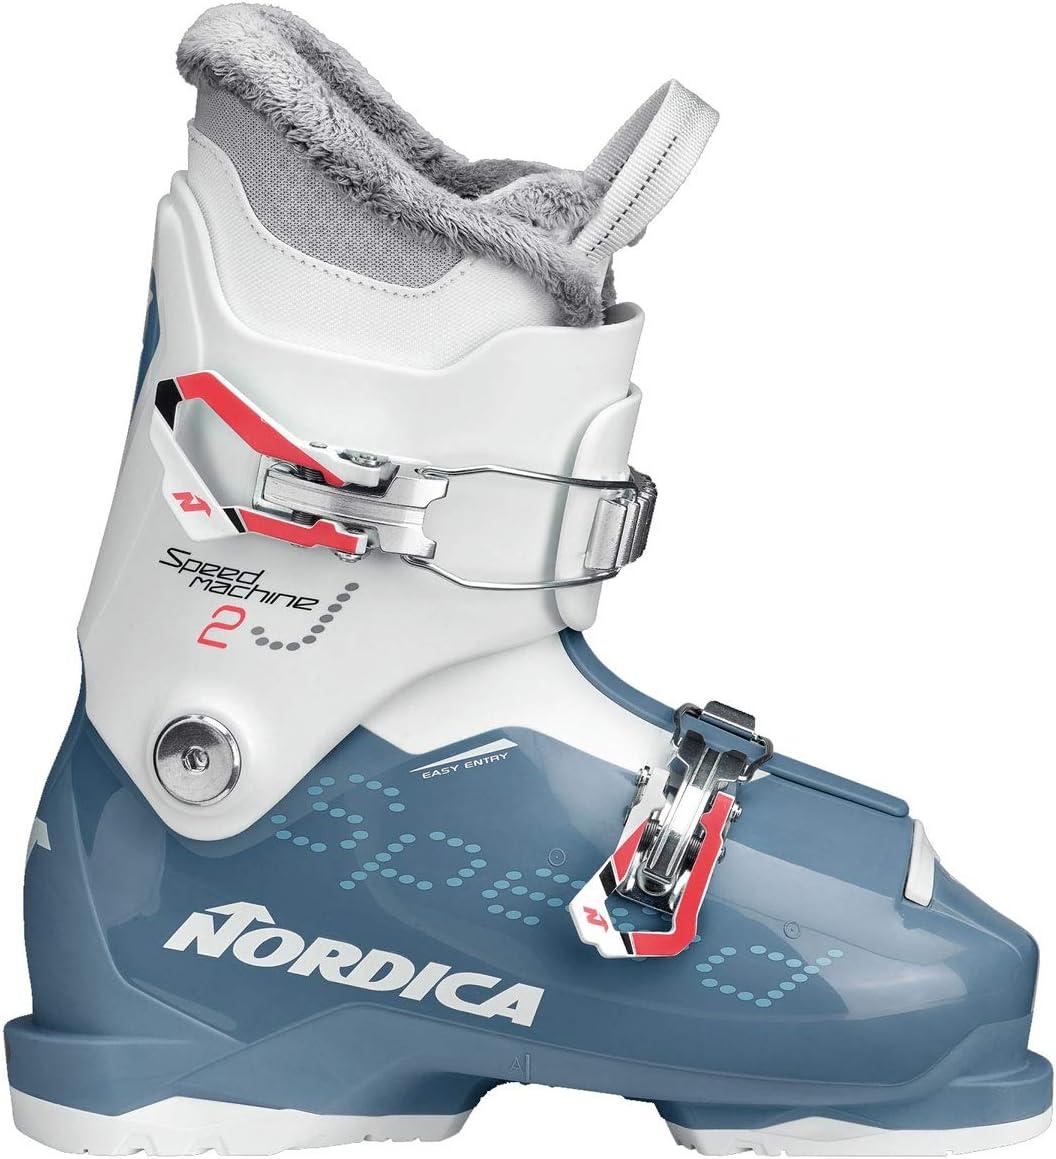 Choice Nordica Speedmachine J2 Ski Boots Deluxe Girls